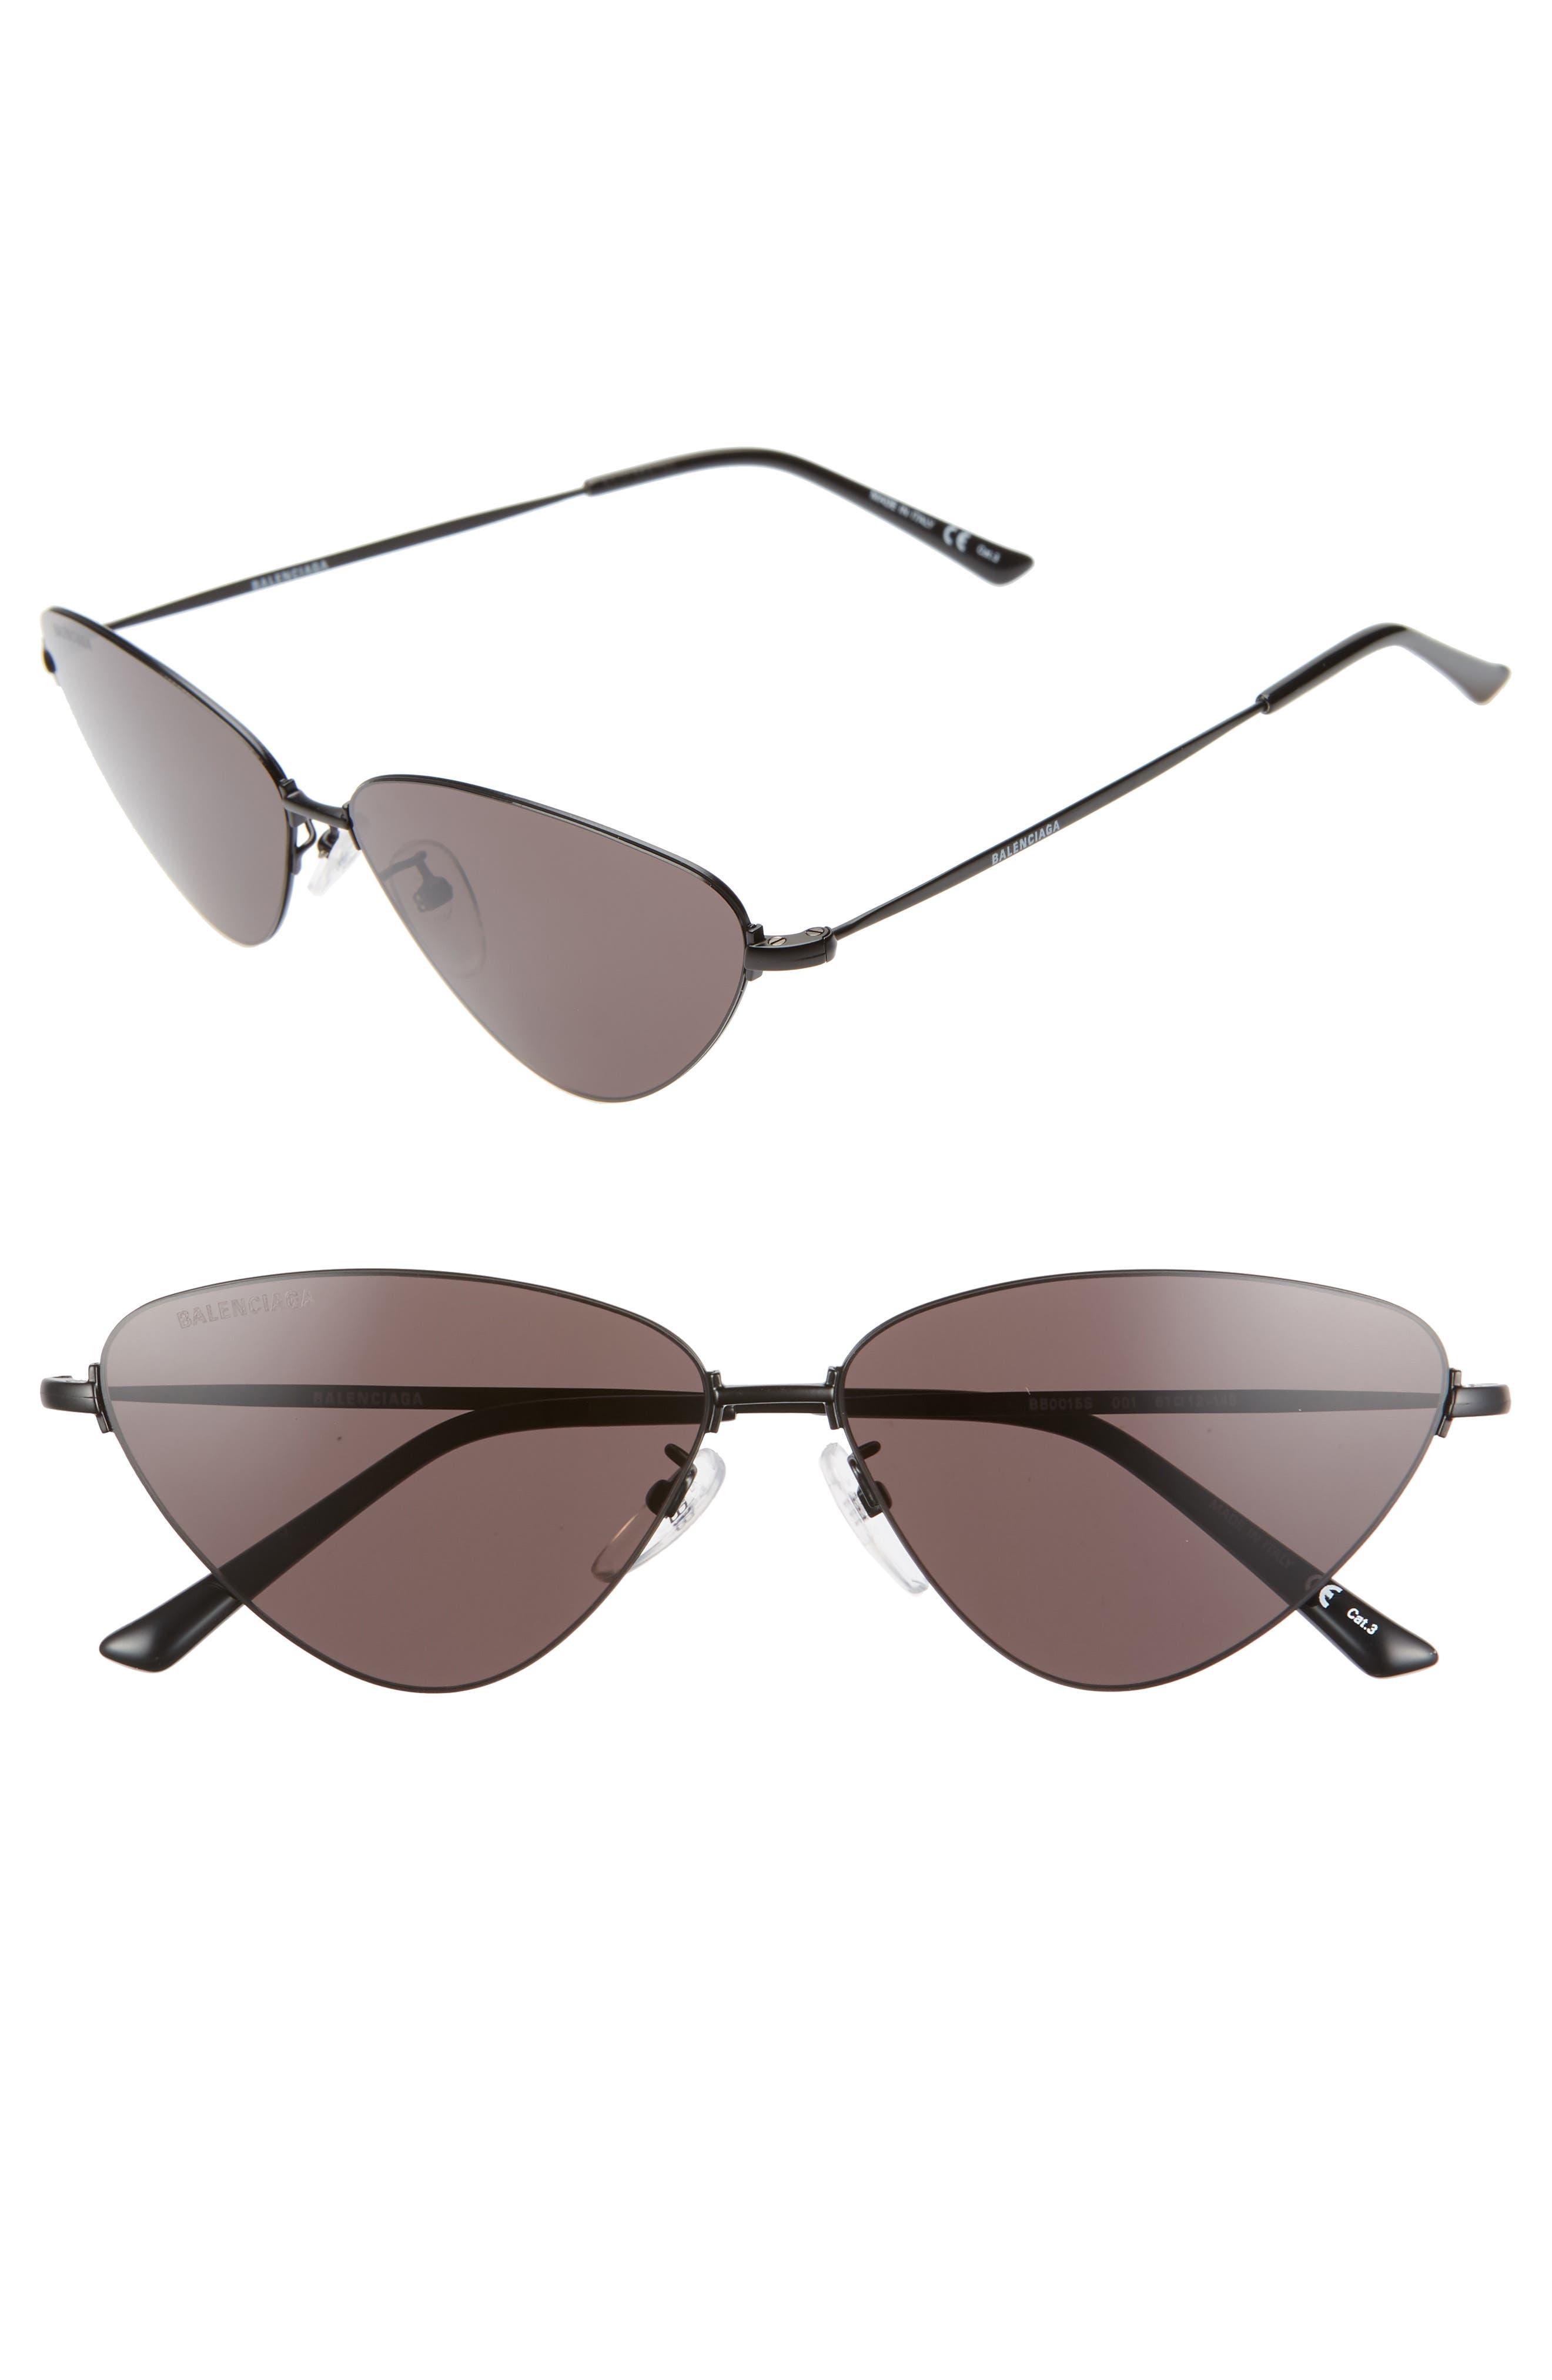 Balenciaga 61Mm Cat Eye Sunglasses - Semi-Matte Black/ Grey